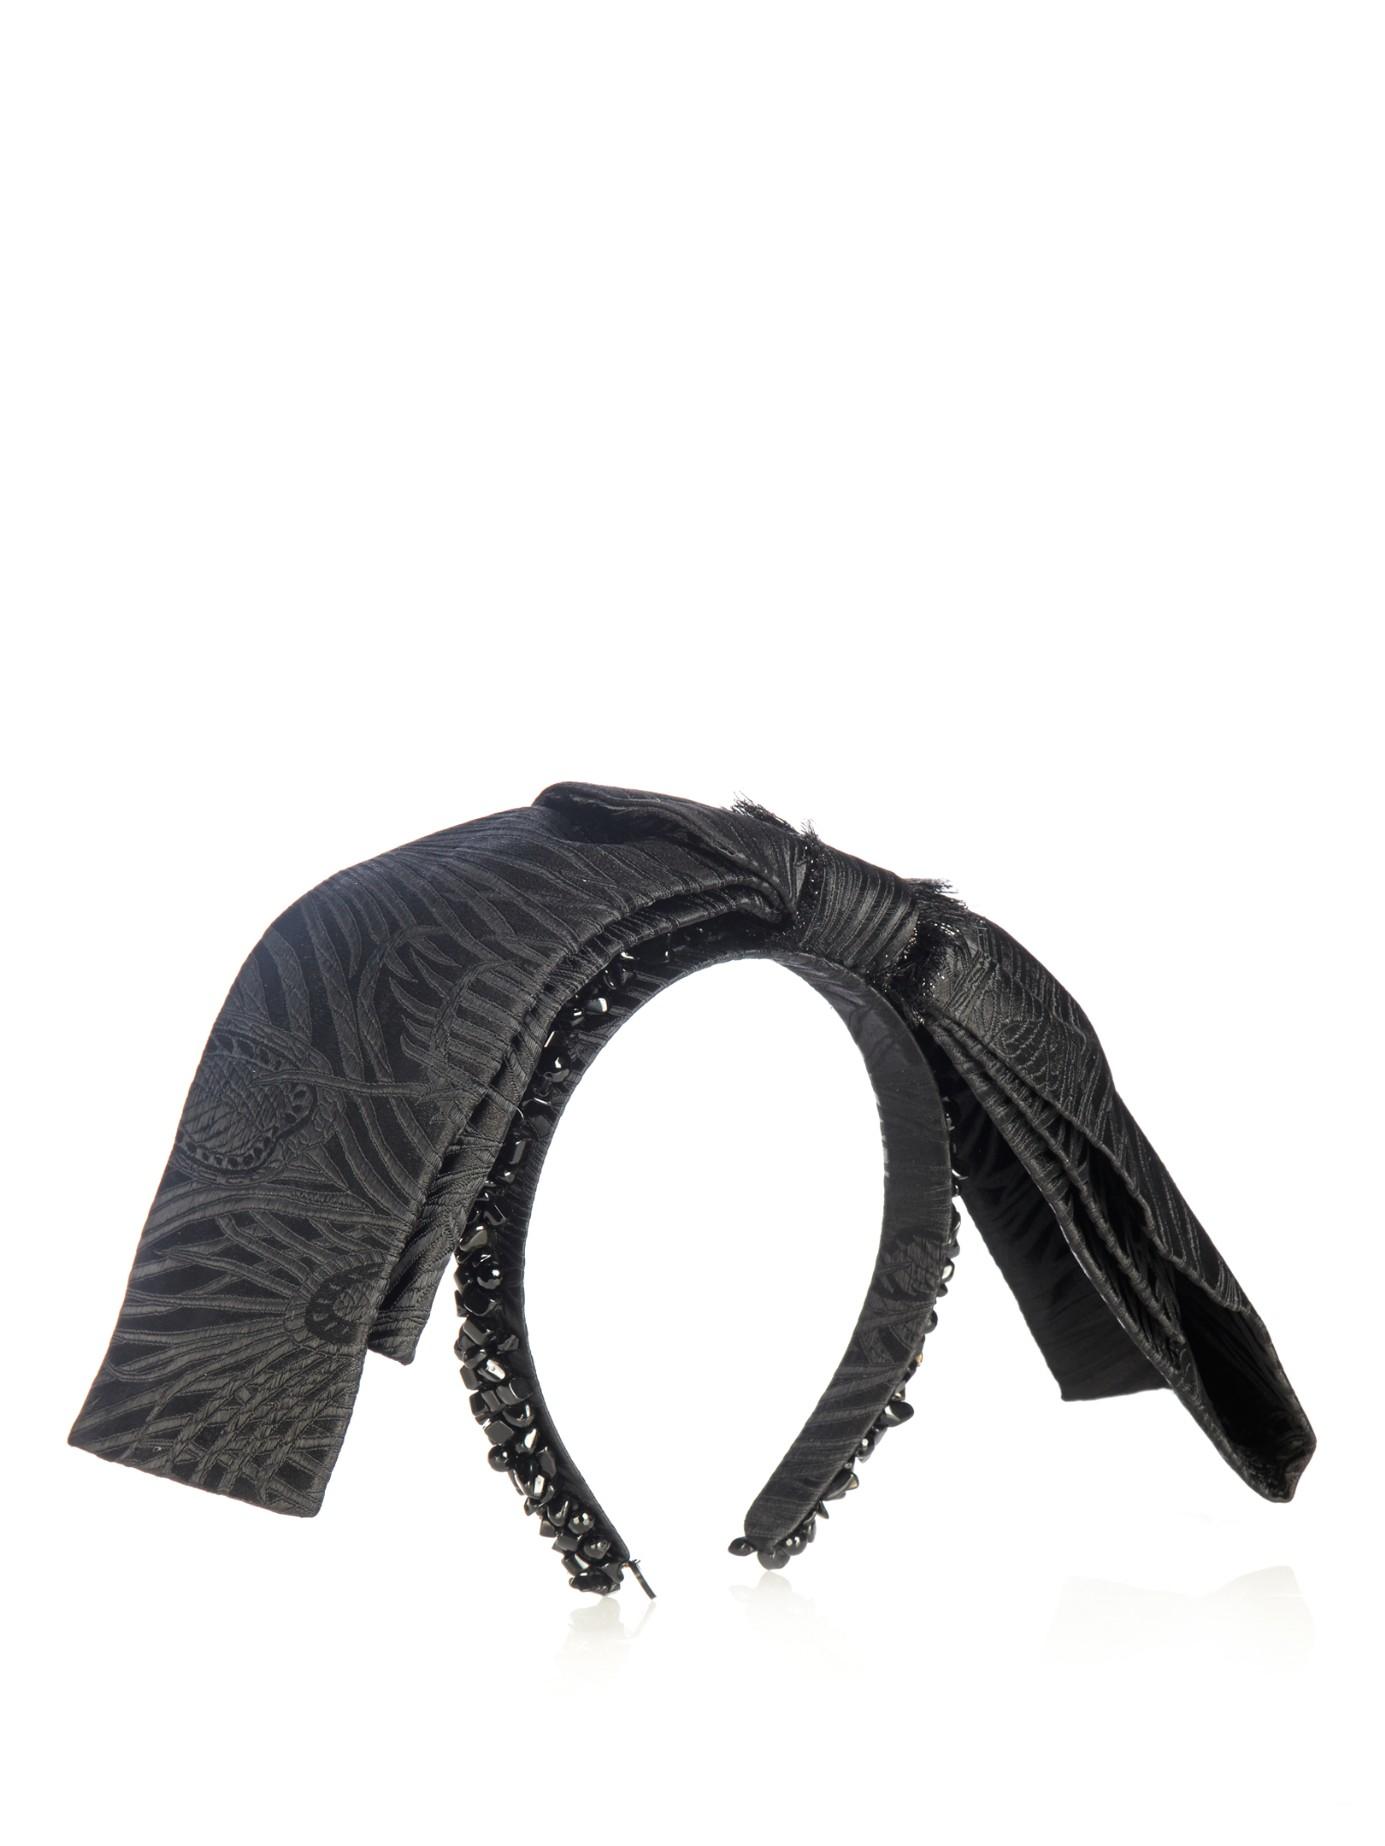 Girls Embellished Headband